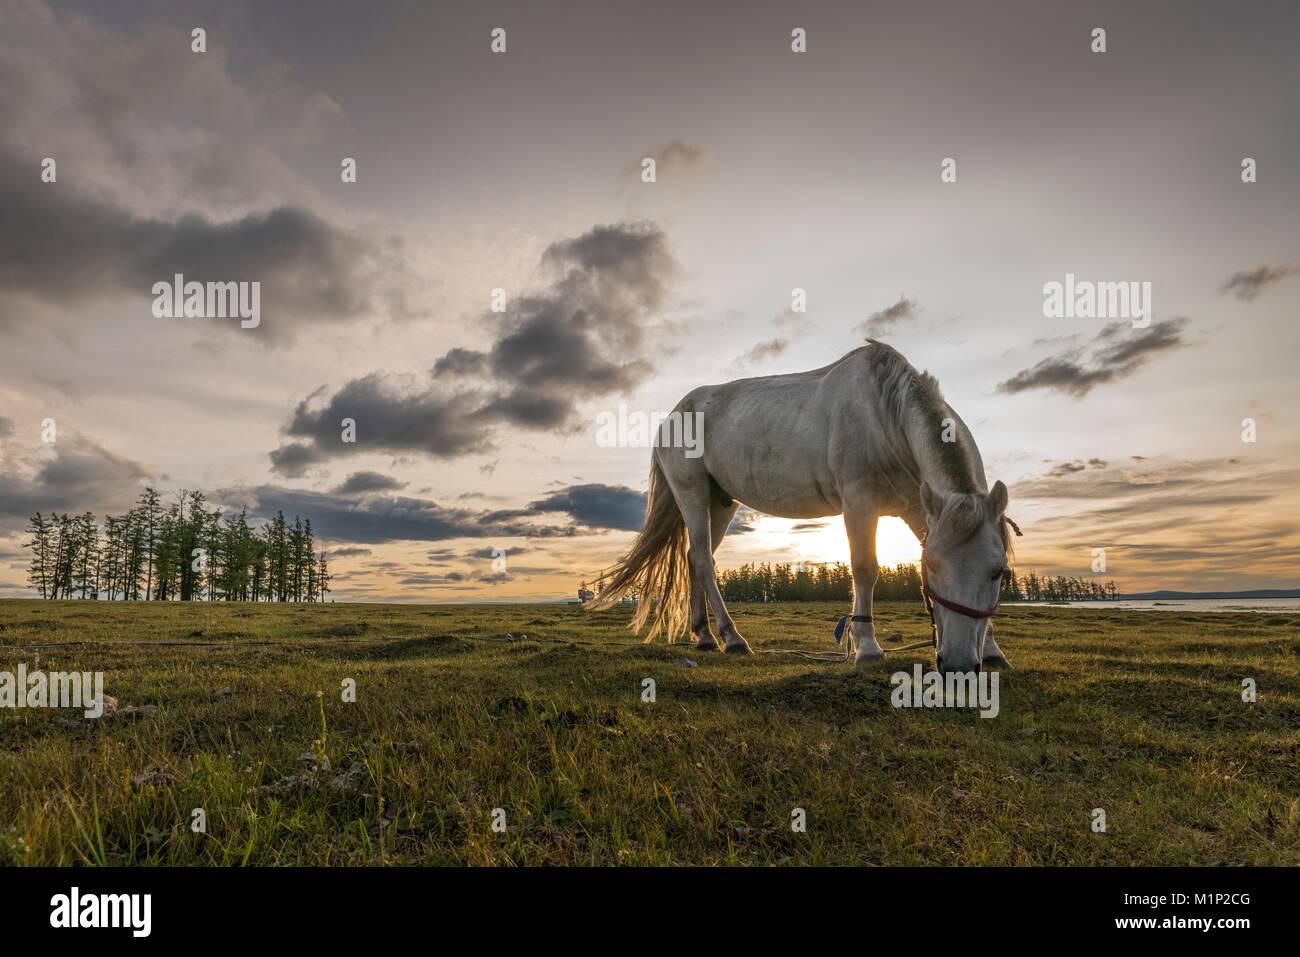 Caballo pastando en las orillas del Lago Hovsgol al atardecer, provincia Hovsgol, Mongolia, Asia Central, África Imagen De Stock